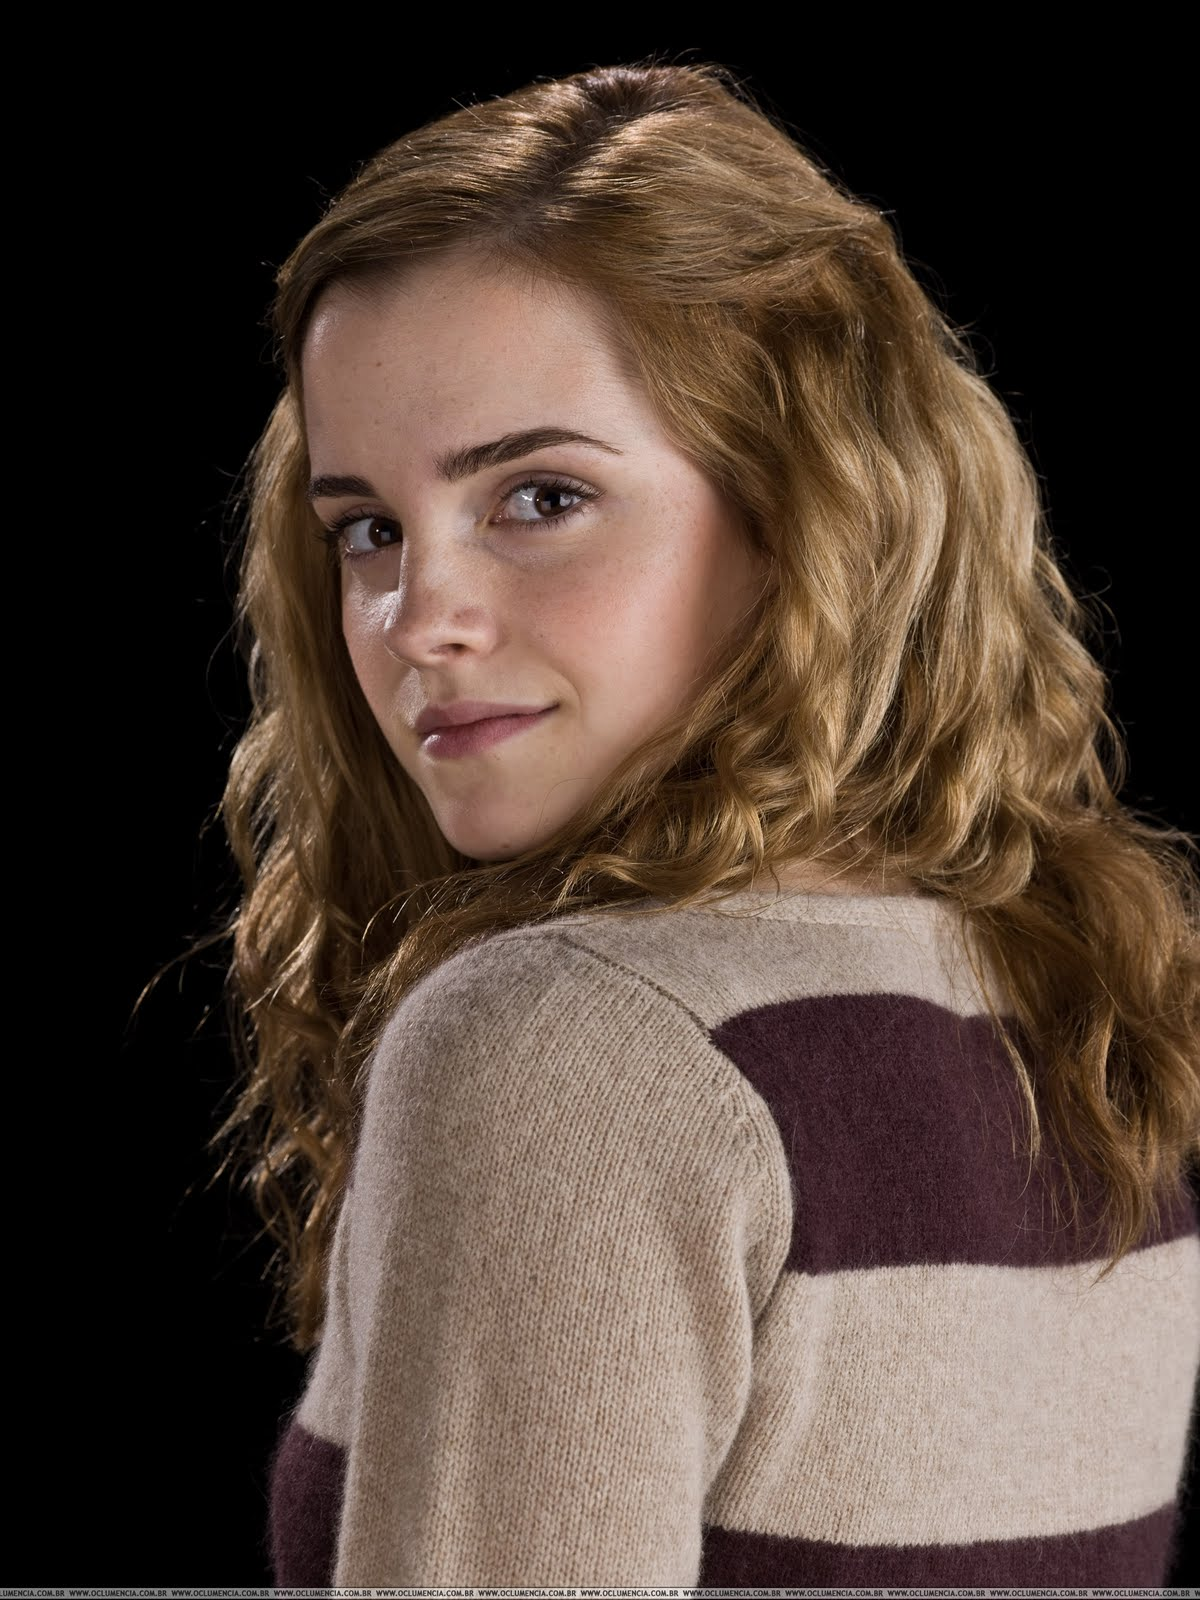 Emma watson updates emma watson new promotional hbp pictures - Qui est hermione granger ...